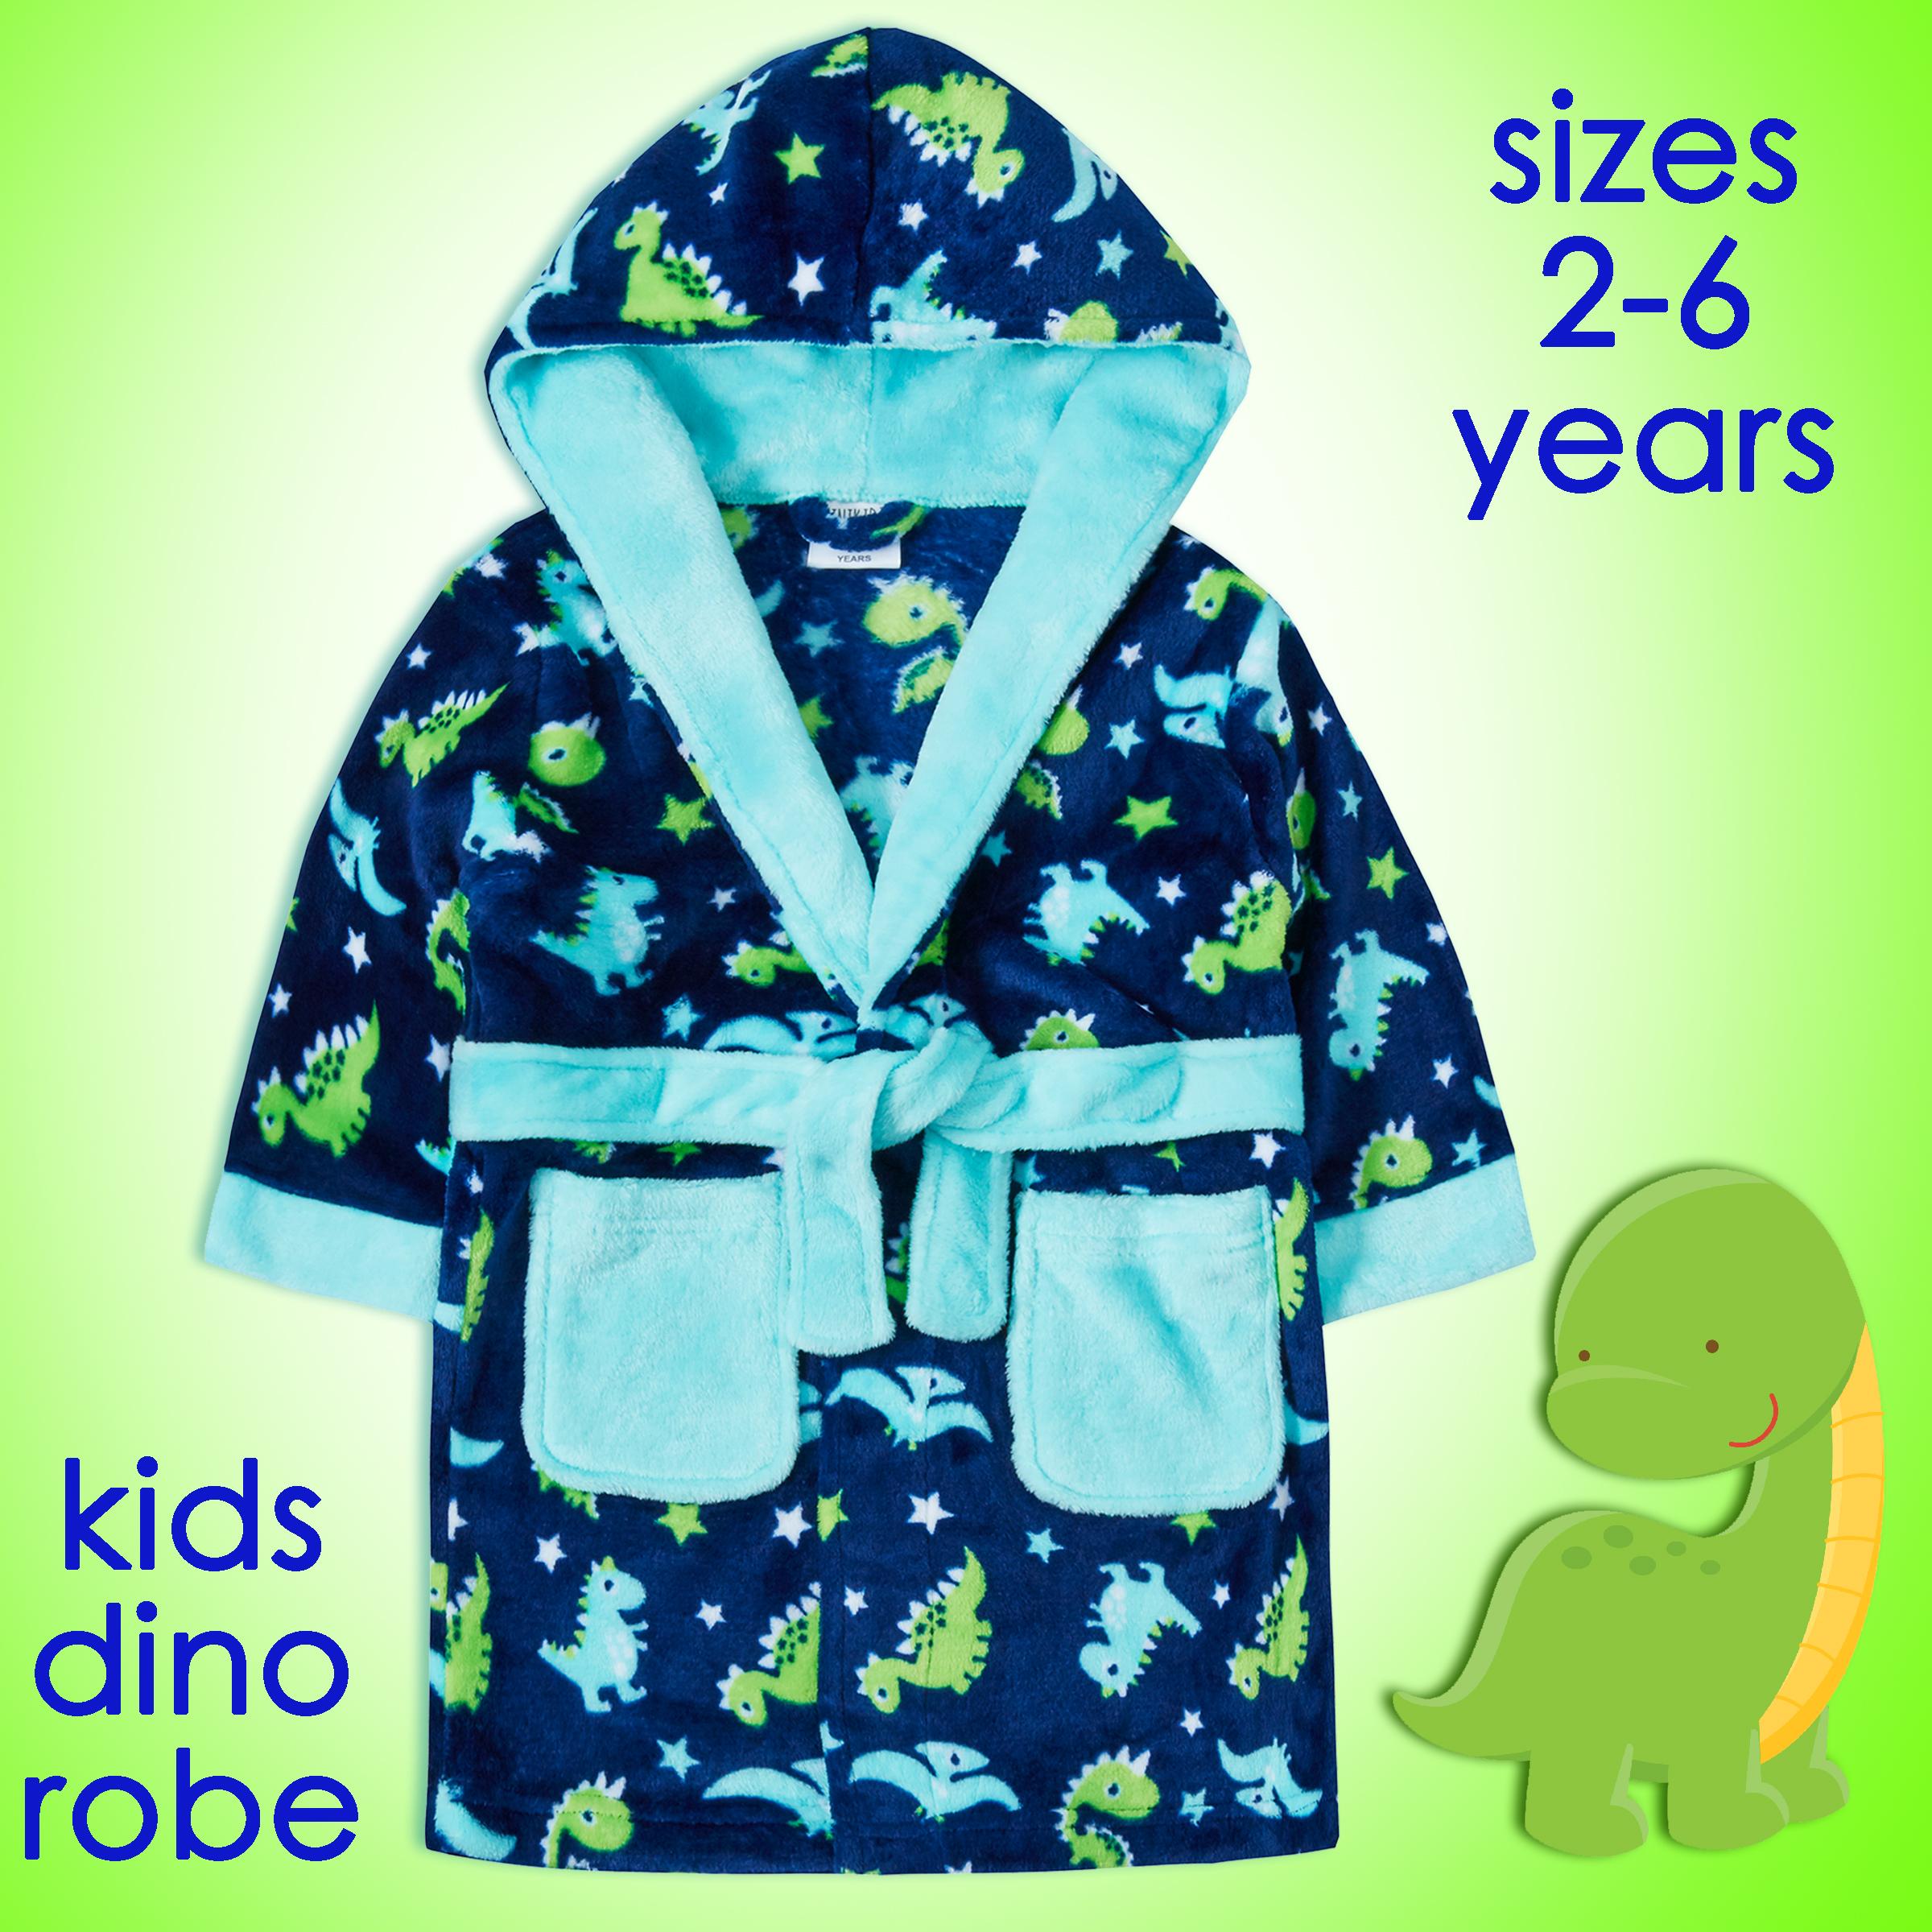 Kids Boys Girls Dinosaurs Robe Dino Pattern Blue Fleece Bathrobe Robe 2 6 Years Ebay